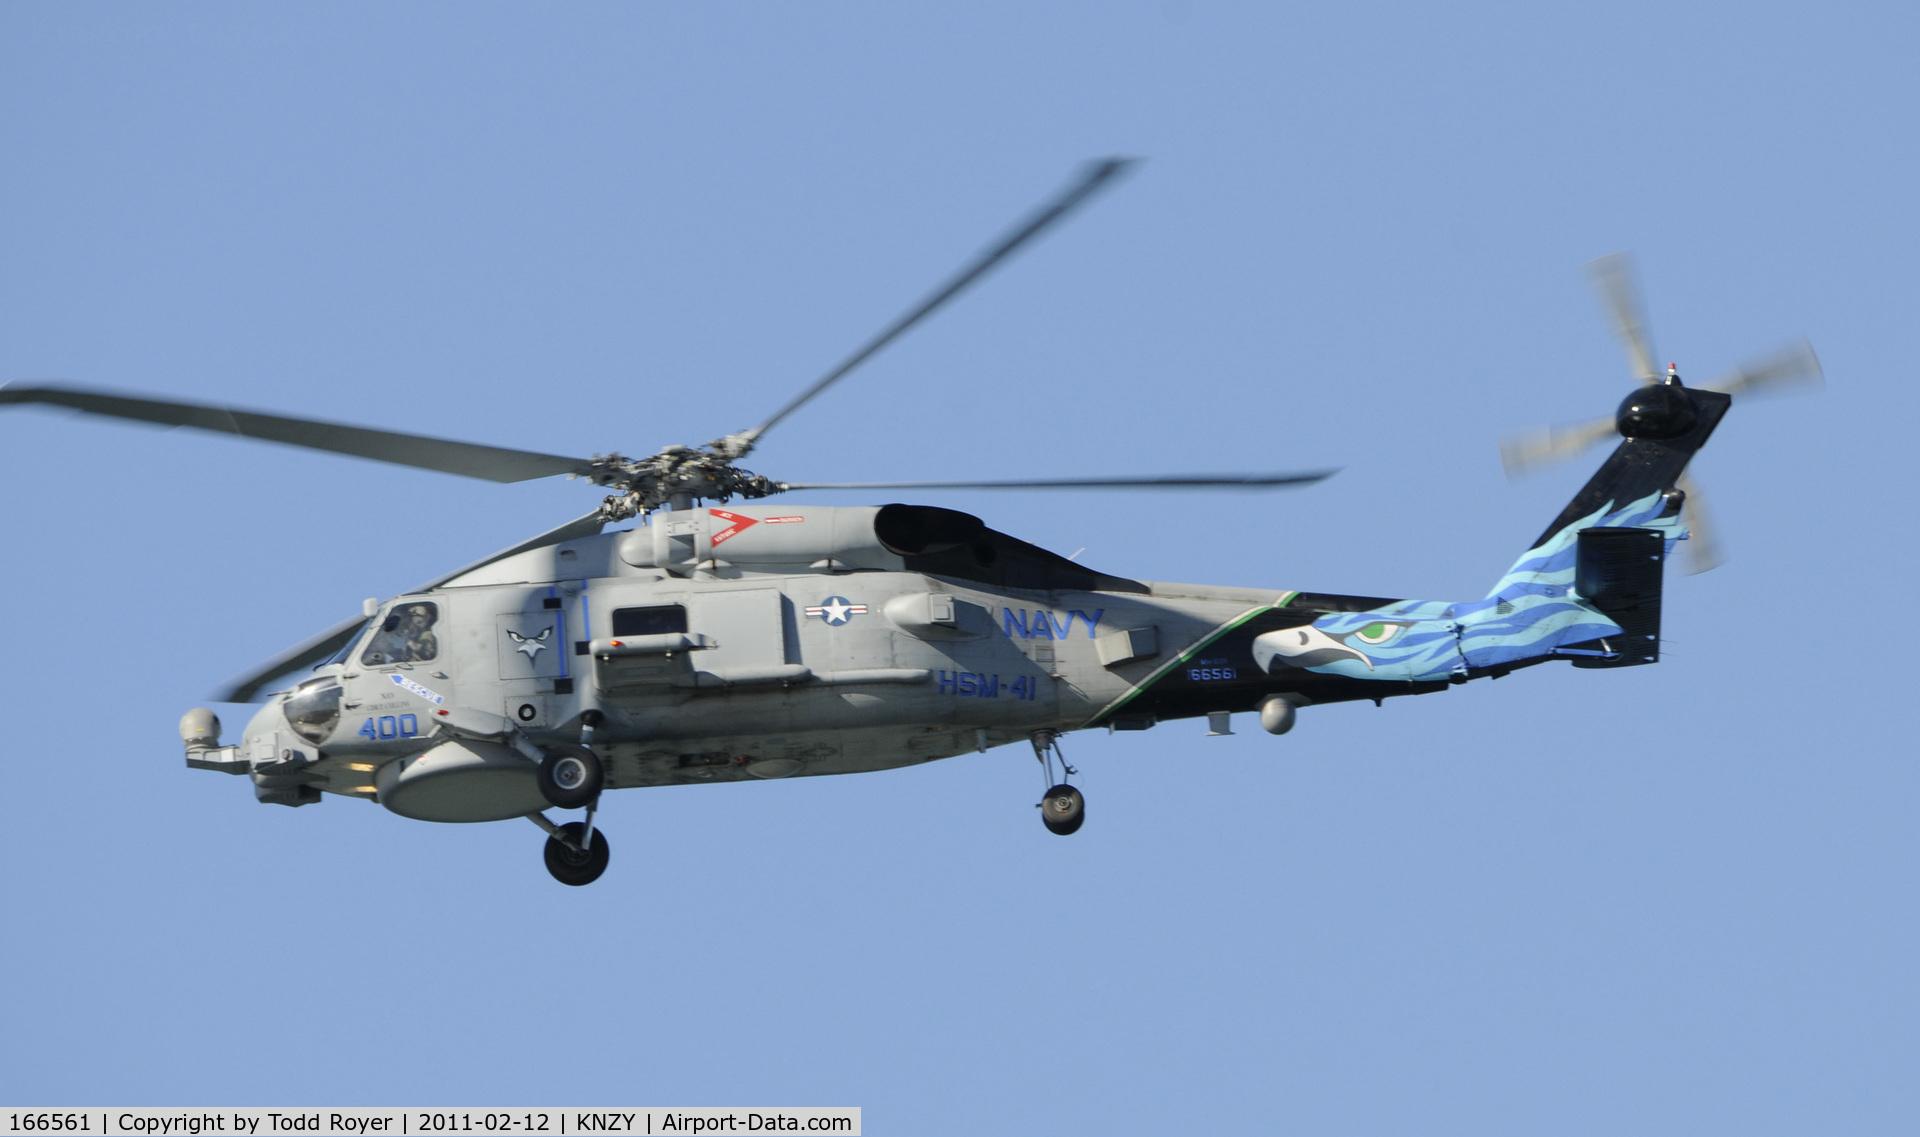 166561, Sikorsky MH-60R Strikehawk C/N 70-3116, Centennial of Naval Aviation